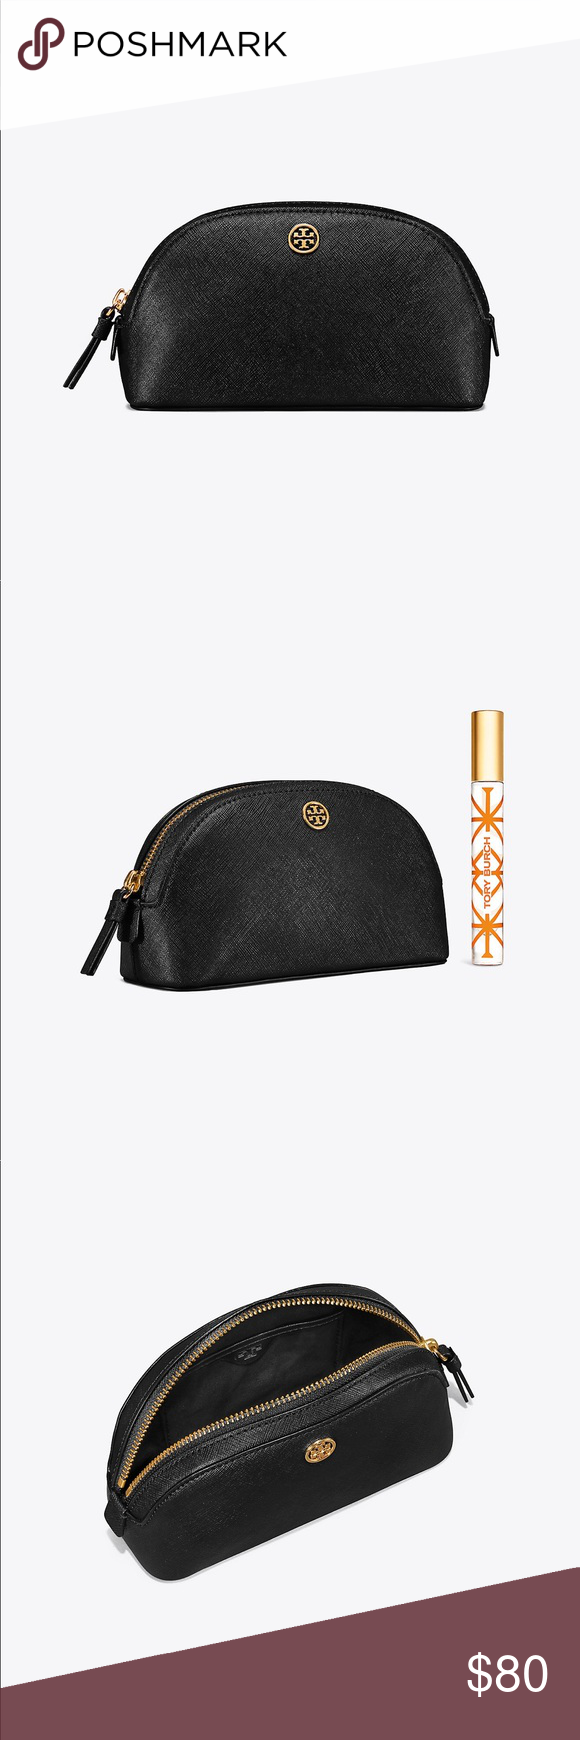 a7d618475c4e NWT Tory Burch Robinson Small Makeup Bag - Black NWT! Tory Burch Bags